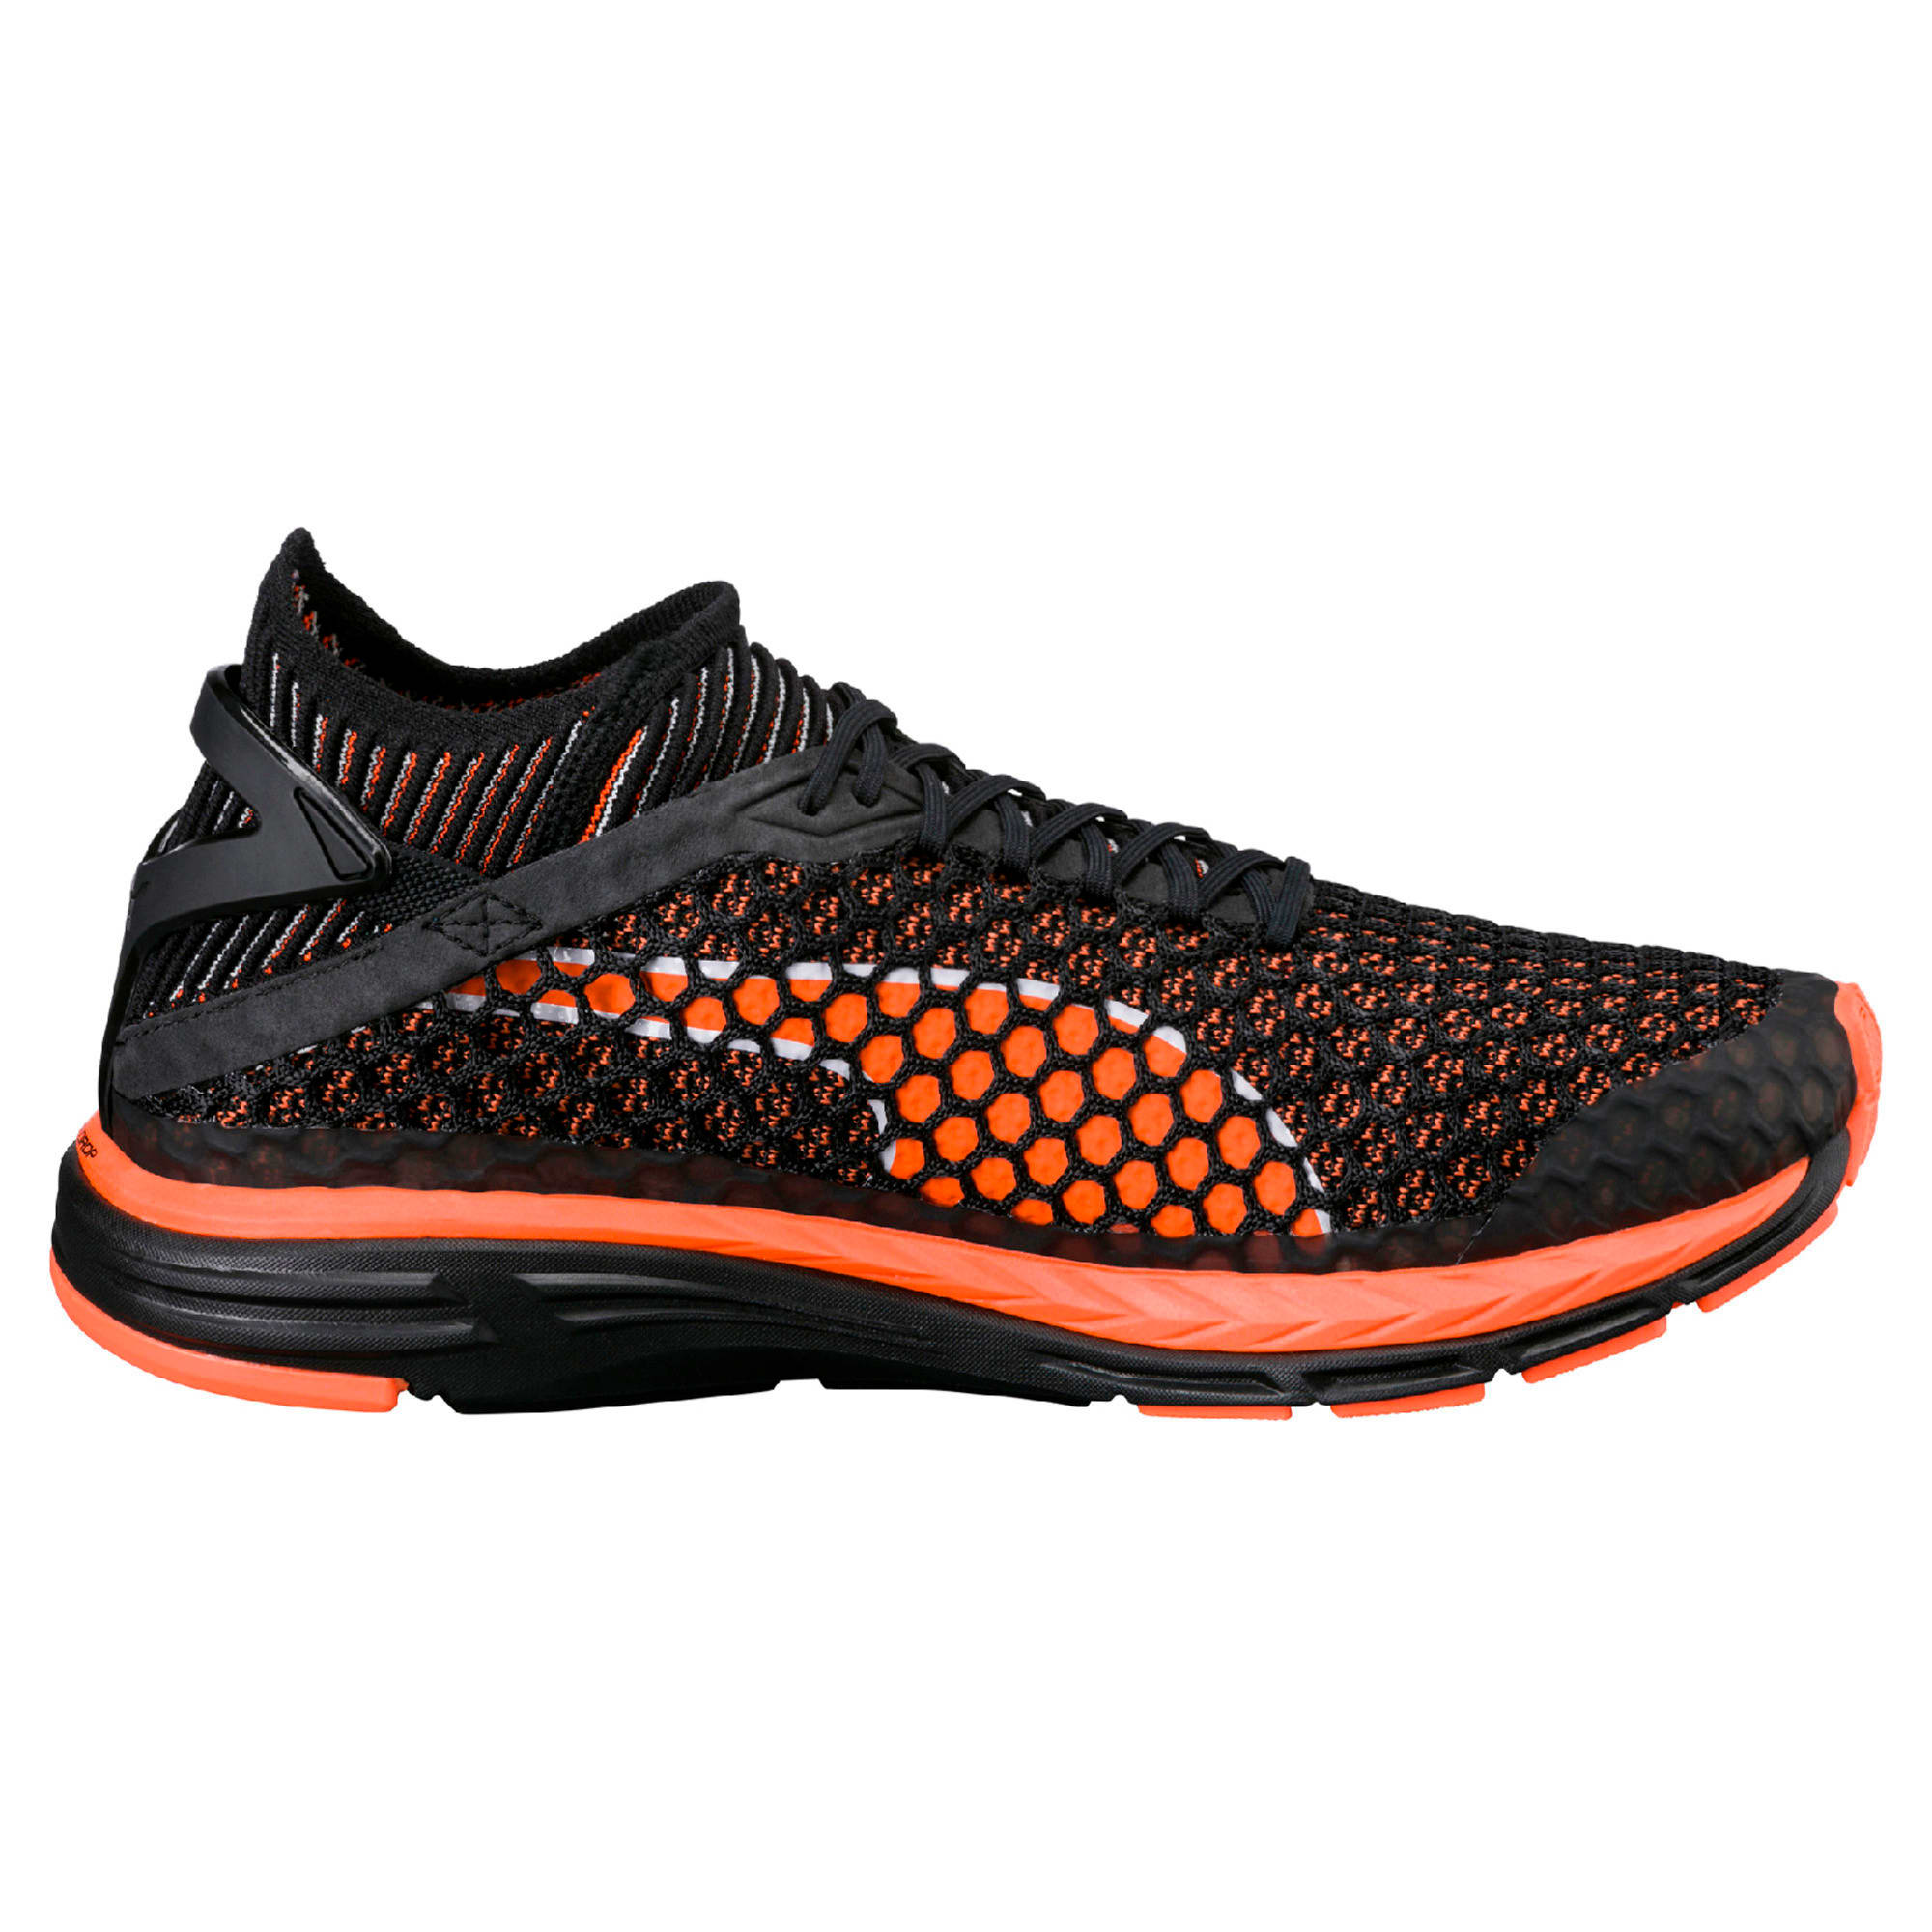 Thumbnail 6 of Speed IGNITE NETFIT Men's Running Shoes, Black-Shocking Orange-White, medium-IND